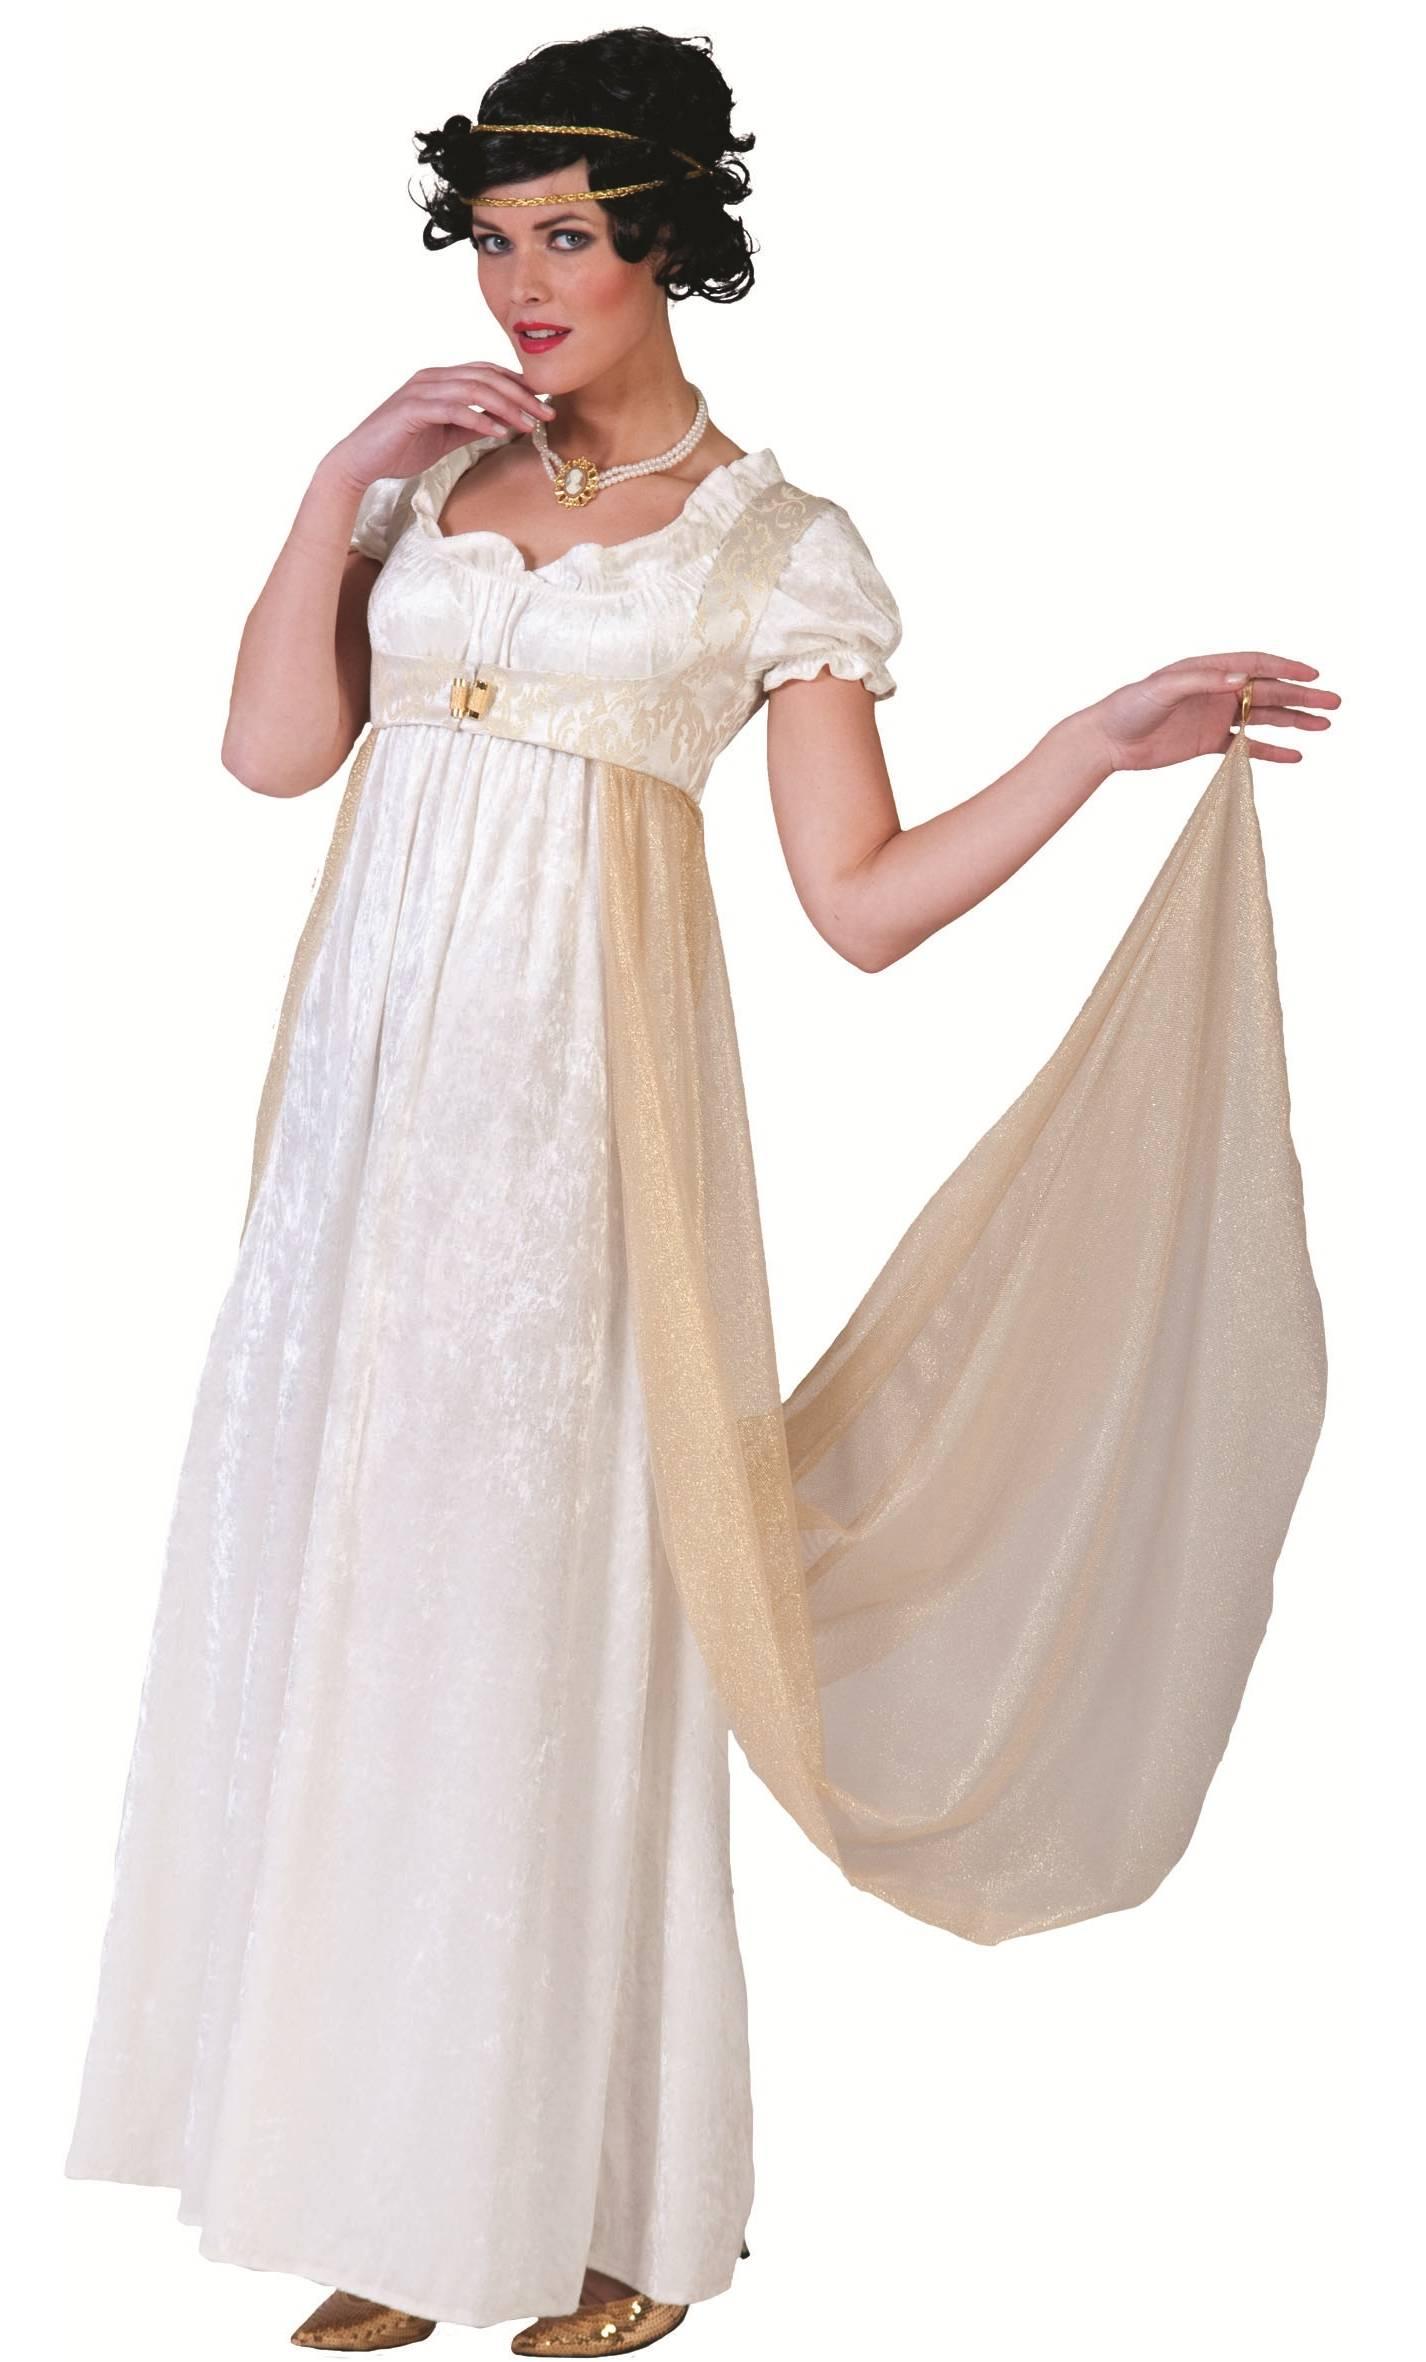 Costume-Joséphine